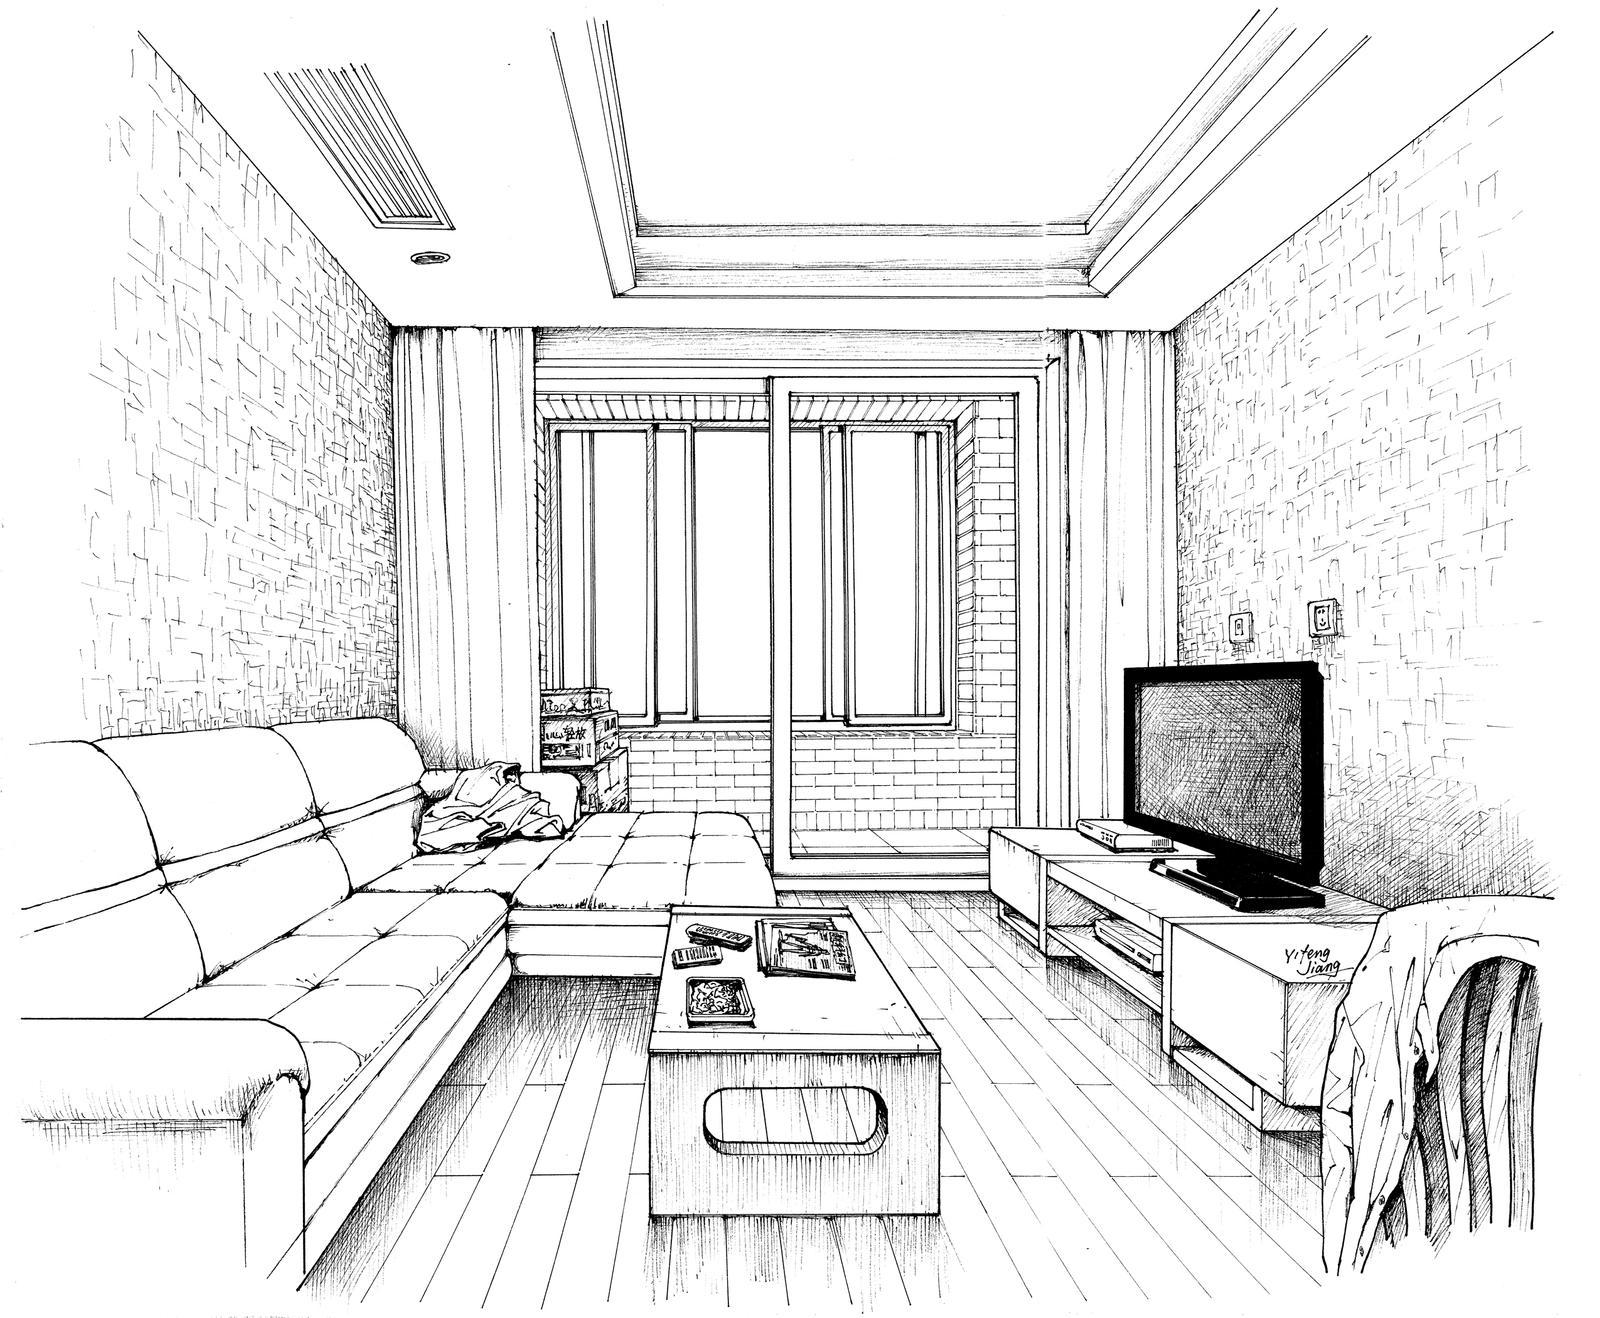 Interior Drawing By JYF1982 On DeviantArt